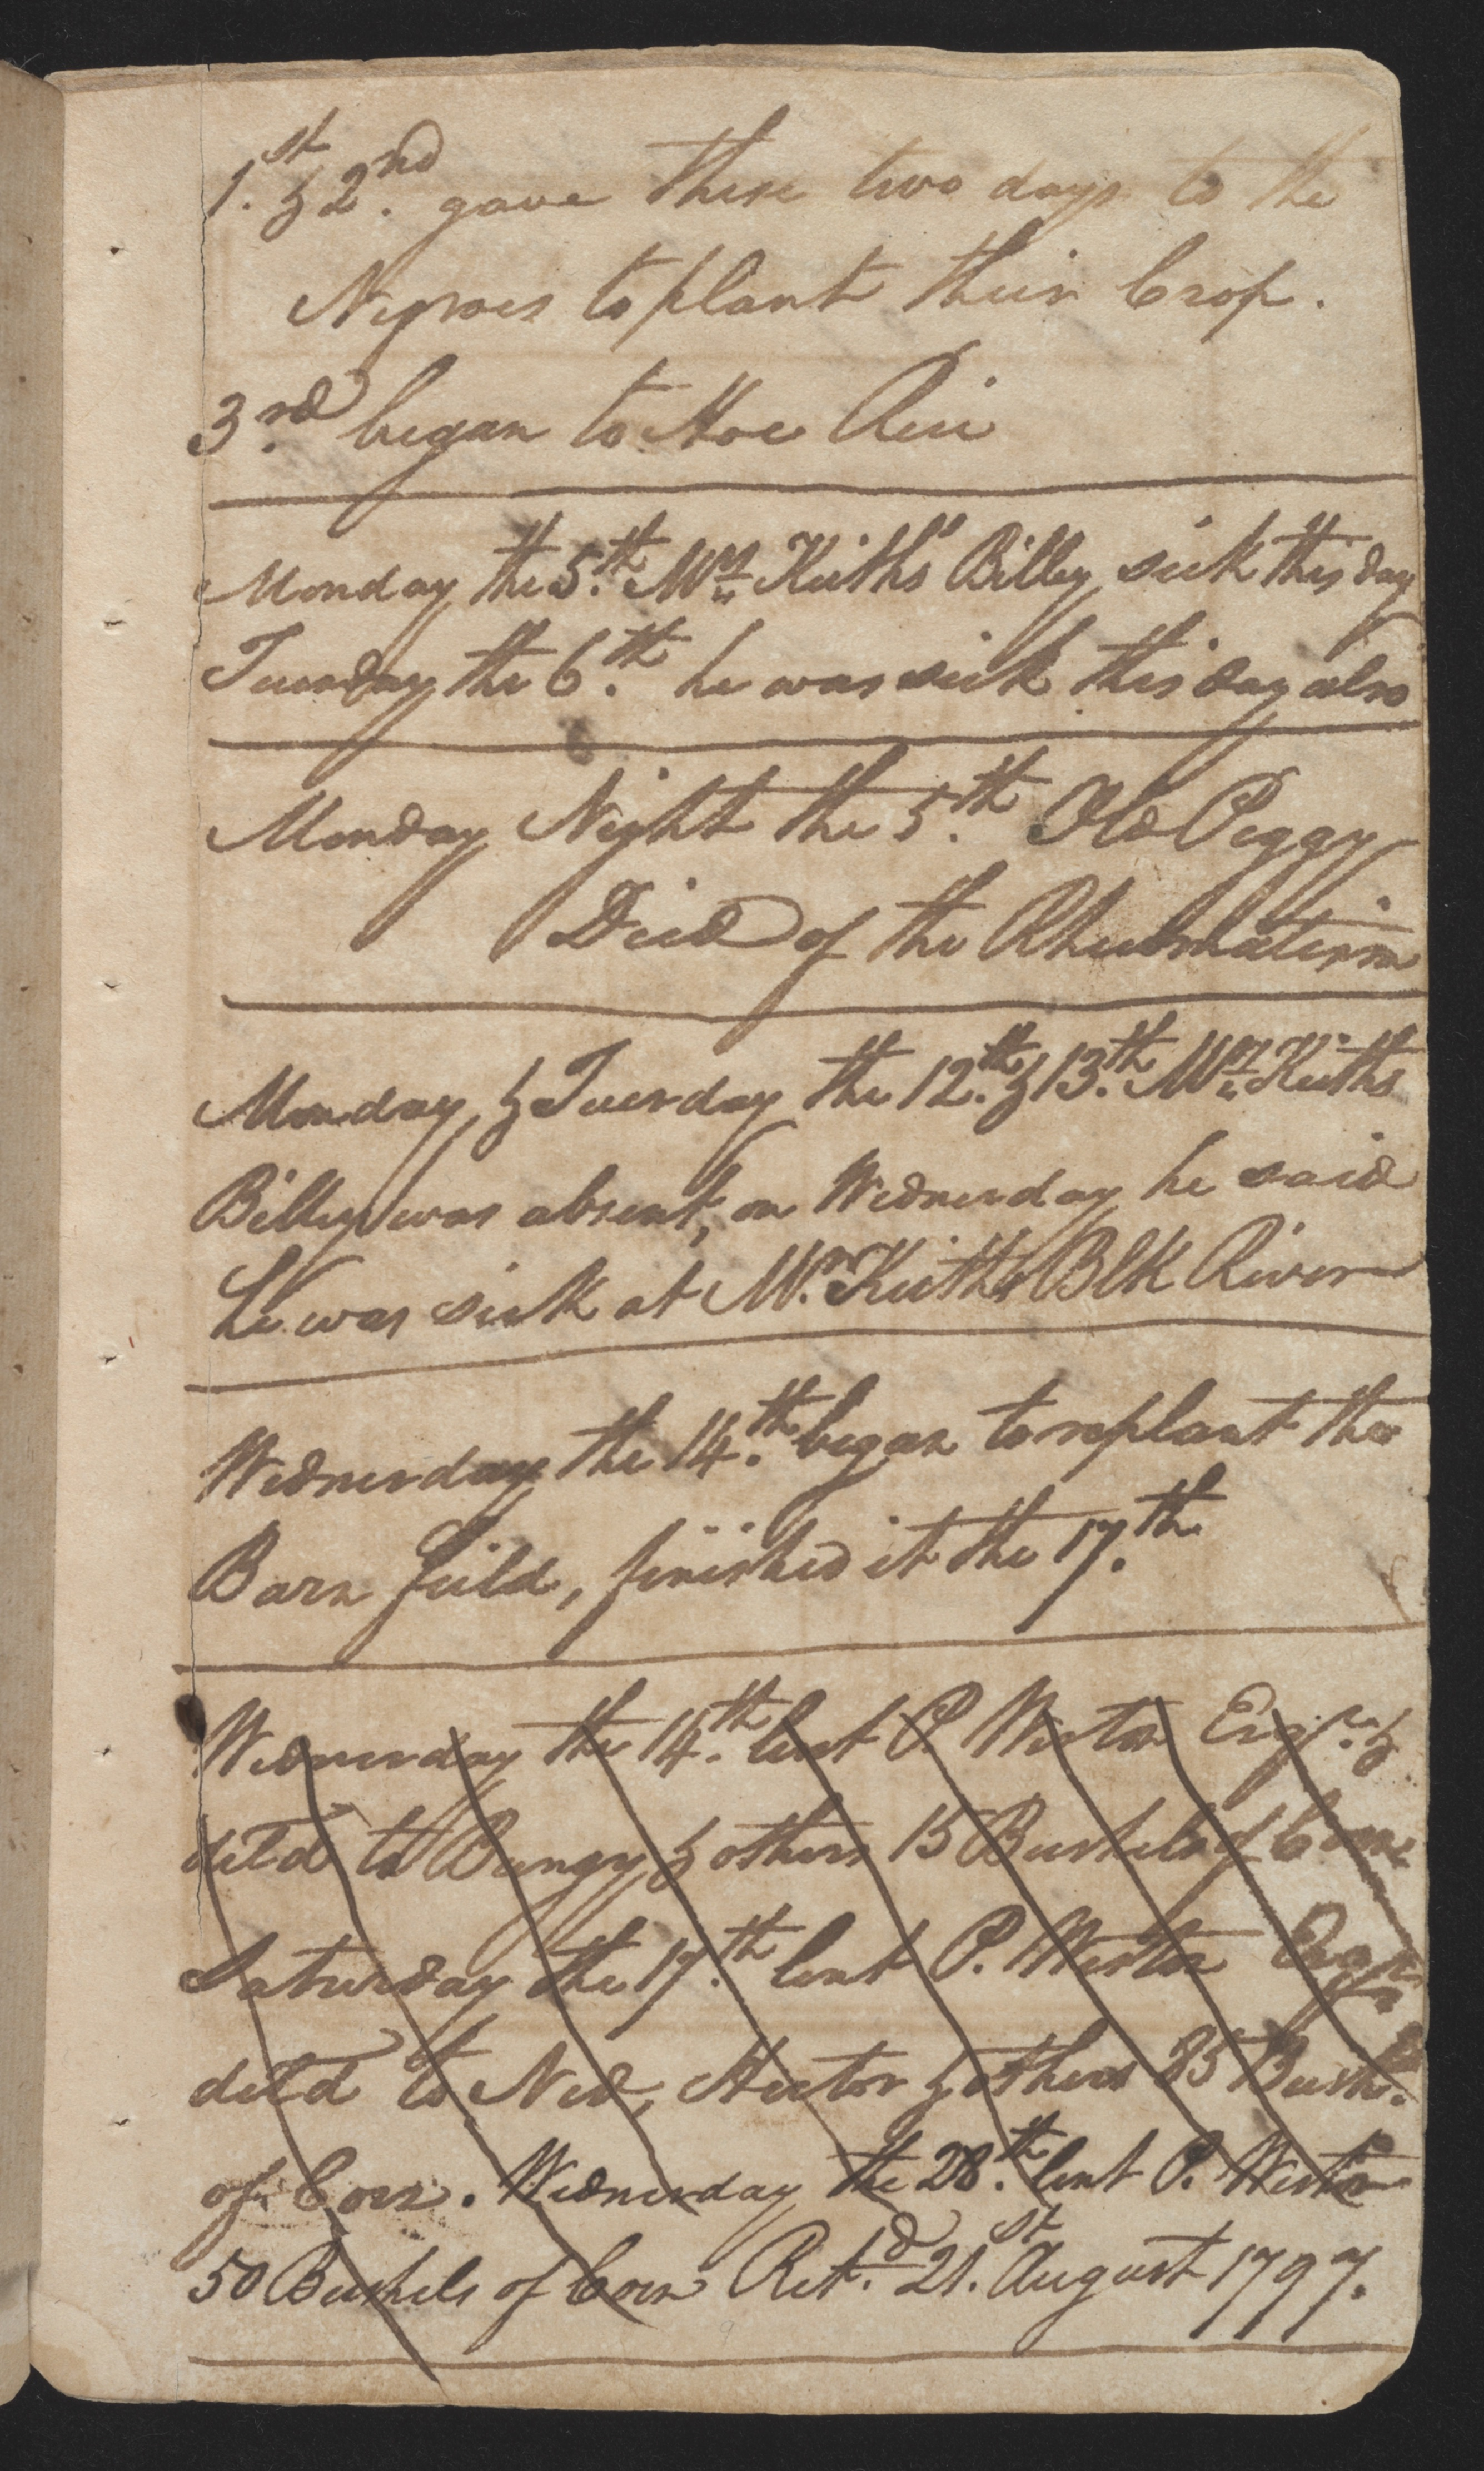 Sandy Island Plantation Journal, Volume 2, 1797, Page 16